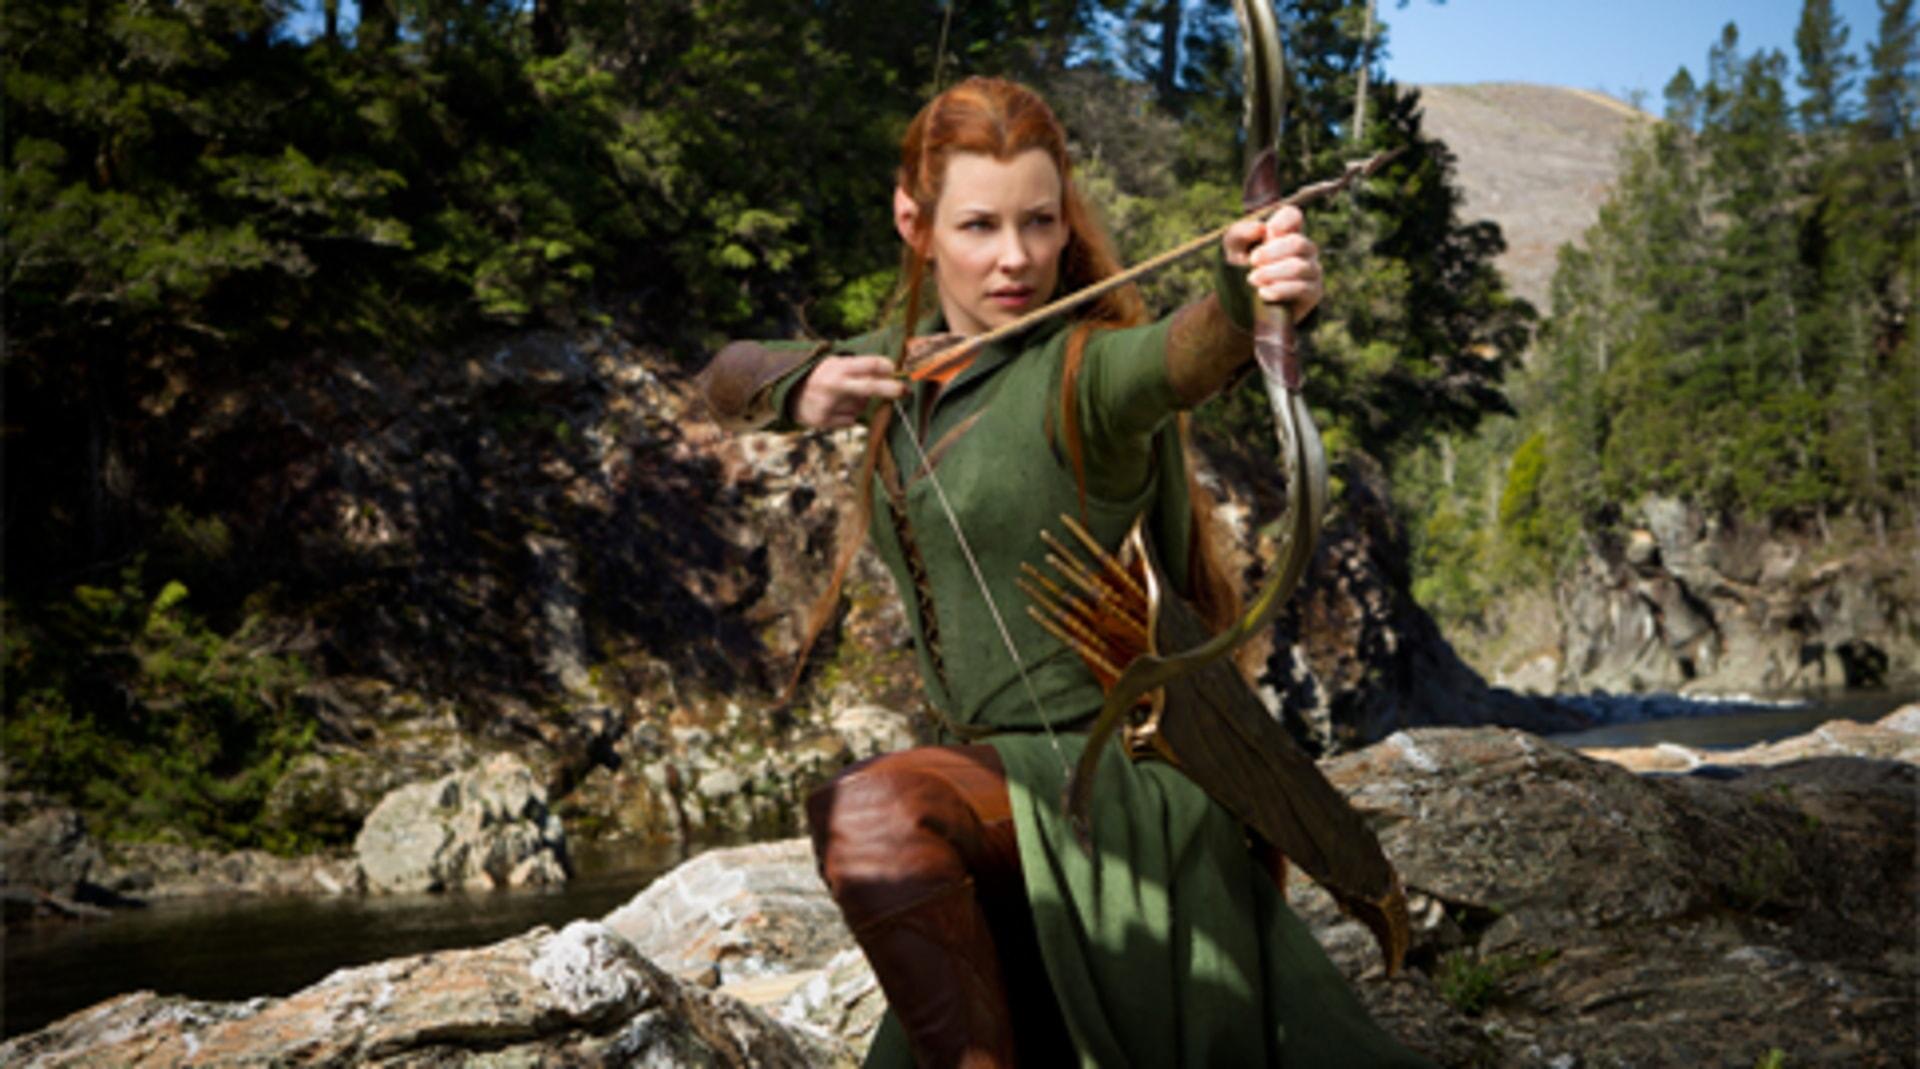 The Hobbit: The Desolation of Smaug - Image 43